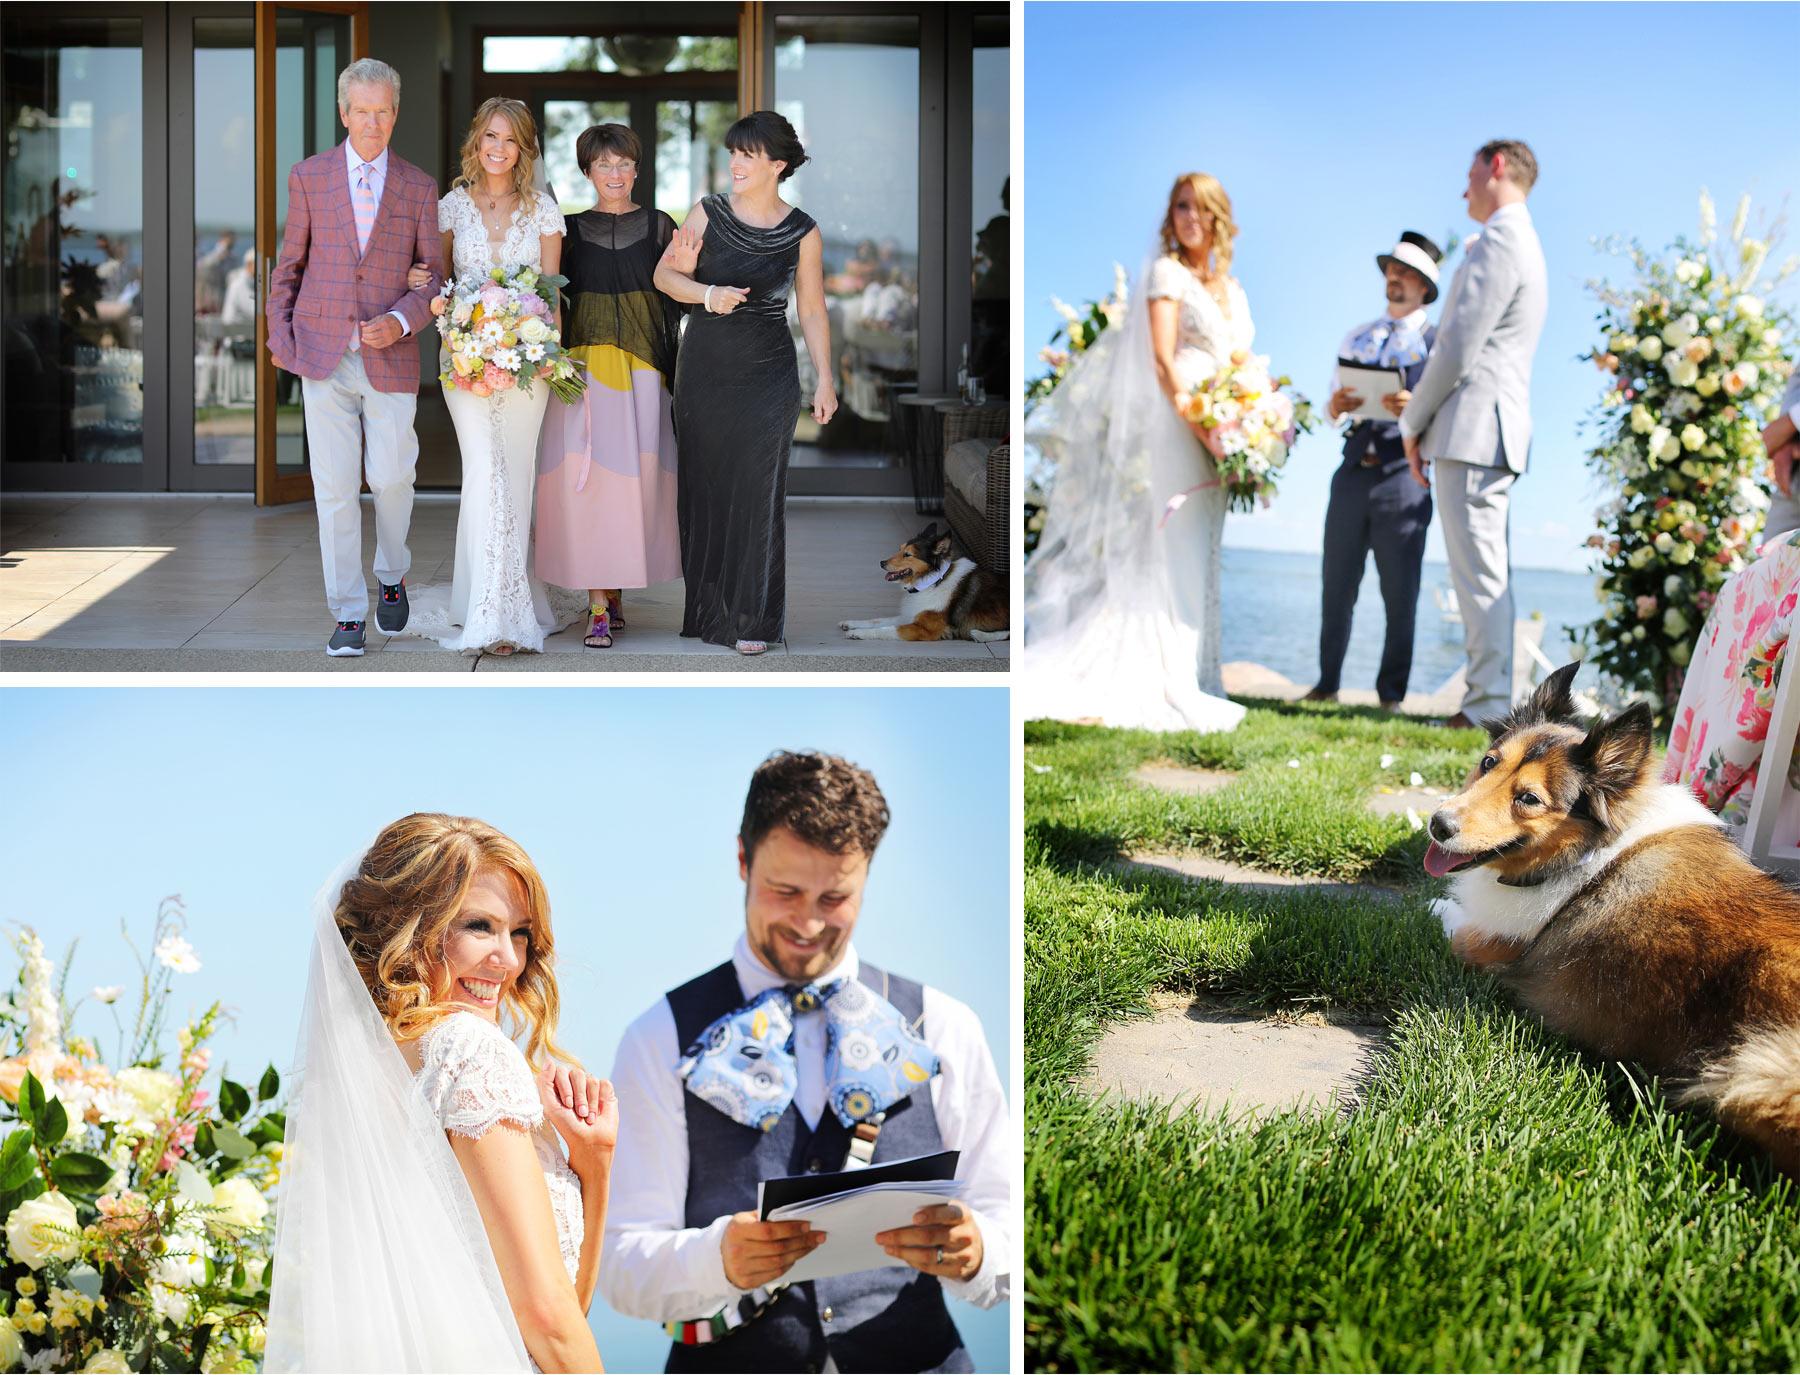 11-Vick-Photography-Wedding-Ottertail-Minnesota-Alice-in-Wonderland-Theme-Ceremony-Outdoor-Lake-Bride-Groom-Tess-and-Greg.jpg